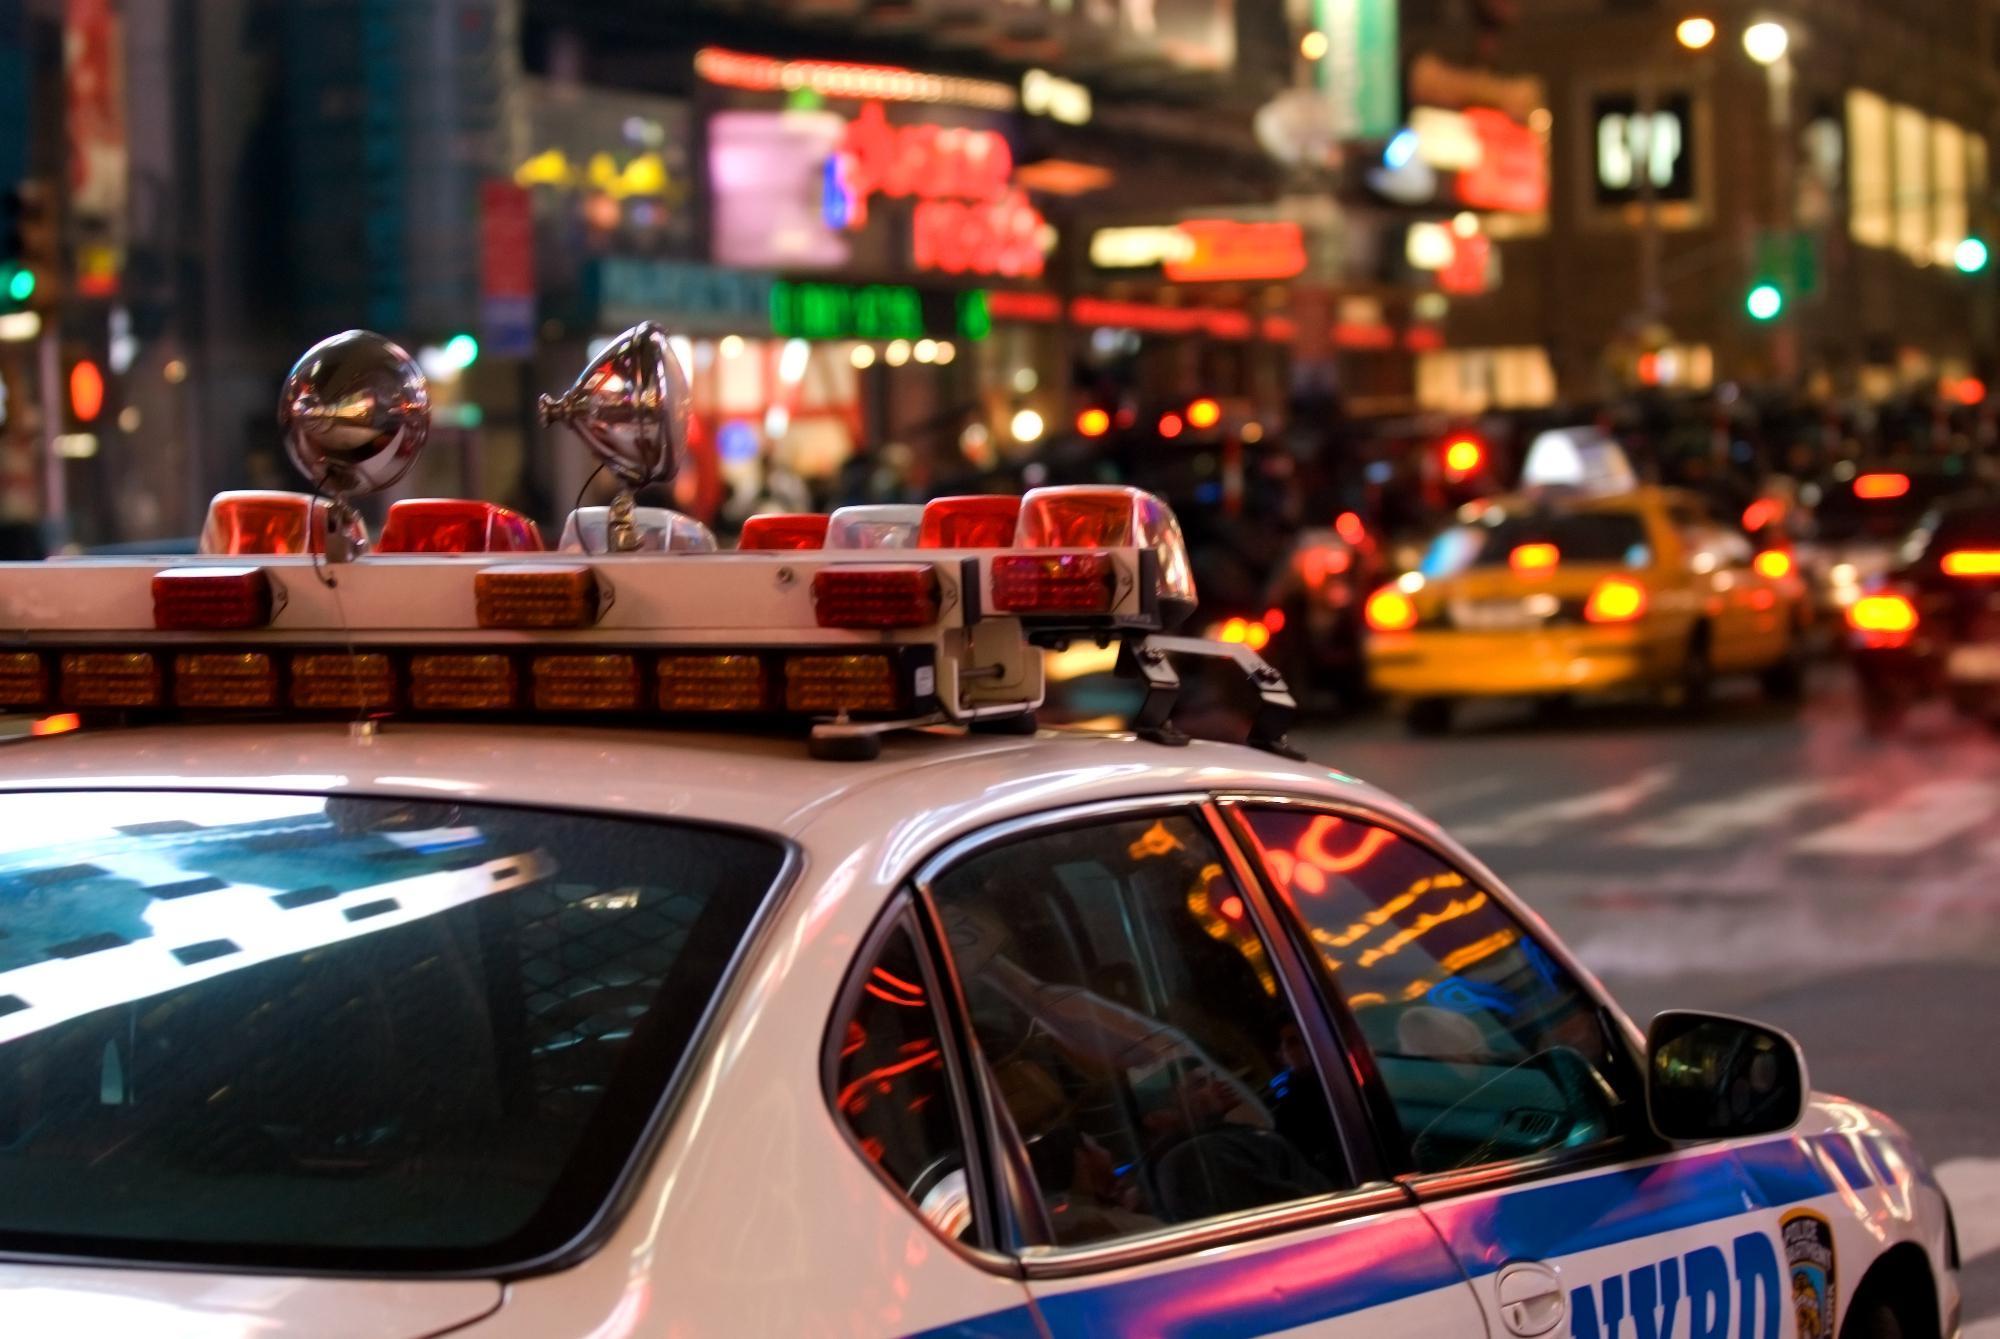 http://www.eleftherostypos.gr/wp-content/uploads/2016/09/police-new-york-usa-1300.jpg